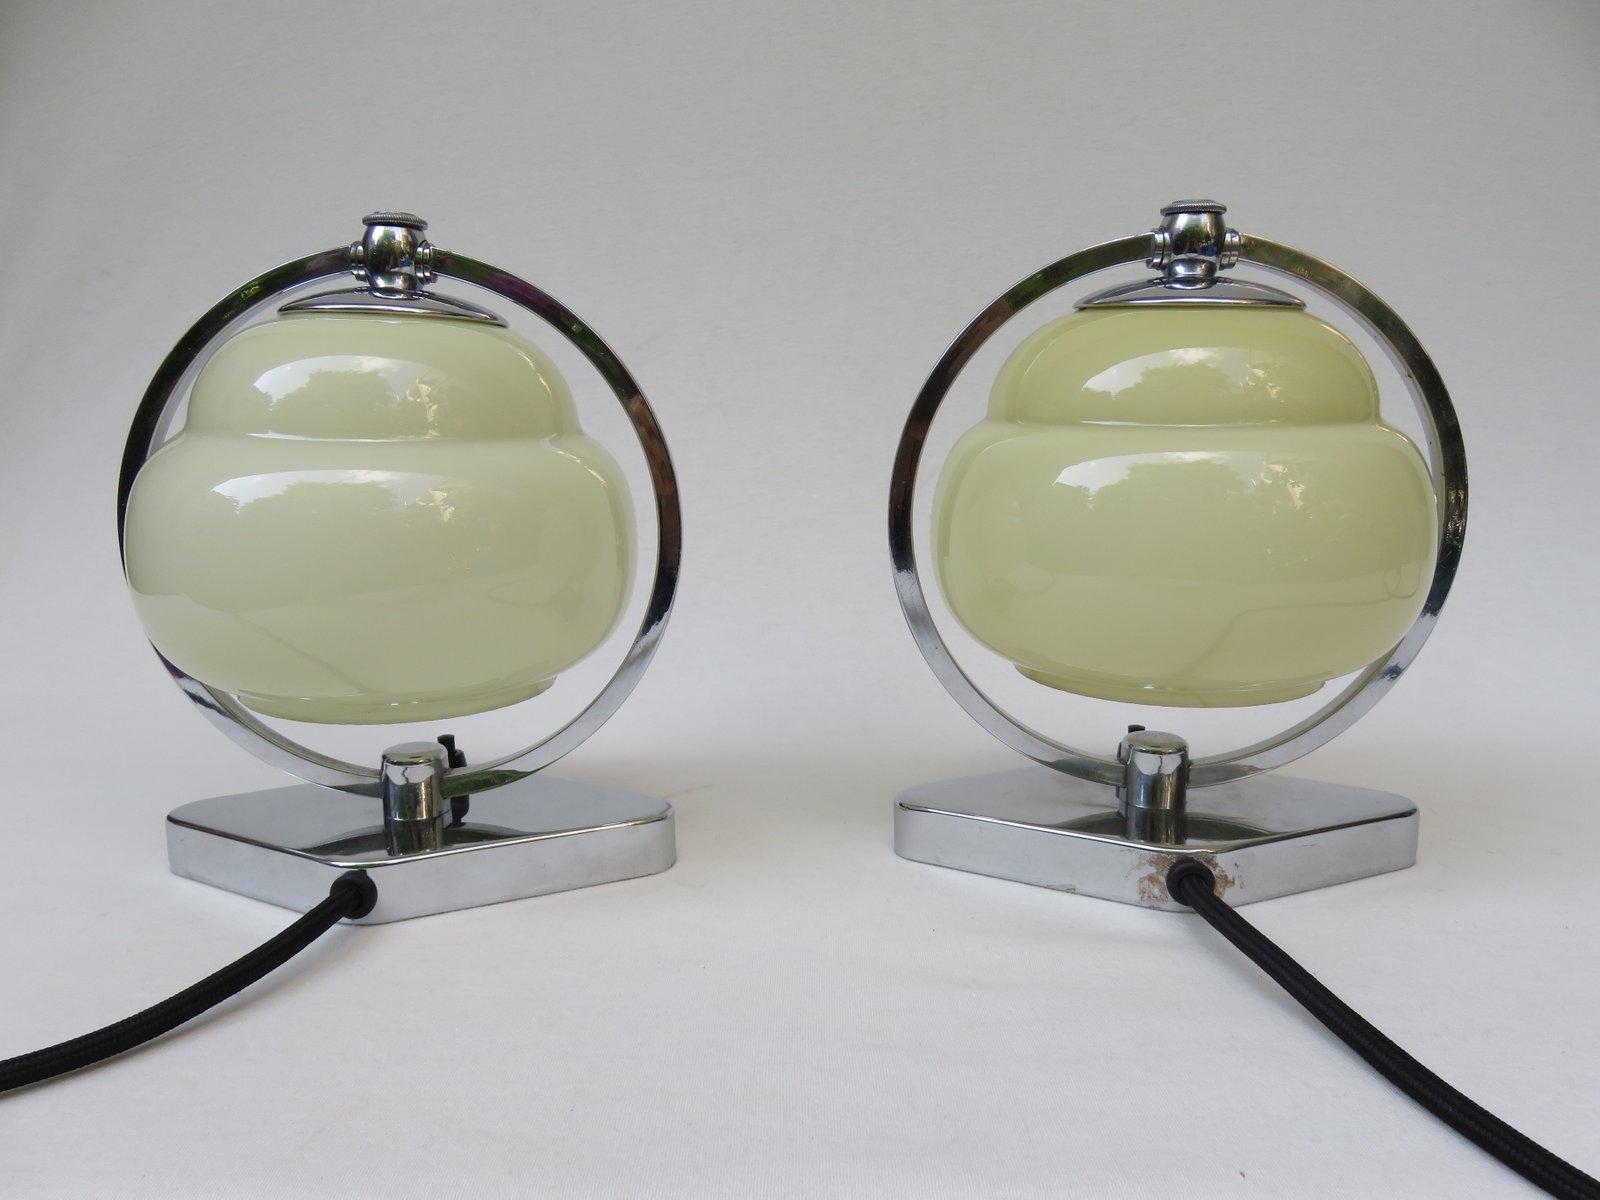 Vintage Art Deco Chrome & Beige Glass Bedside Lamps, Set